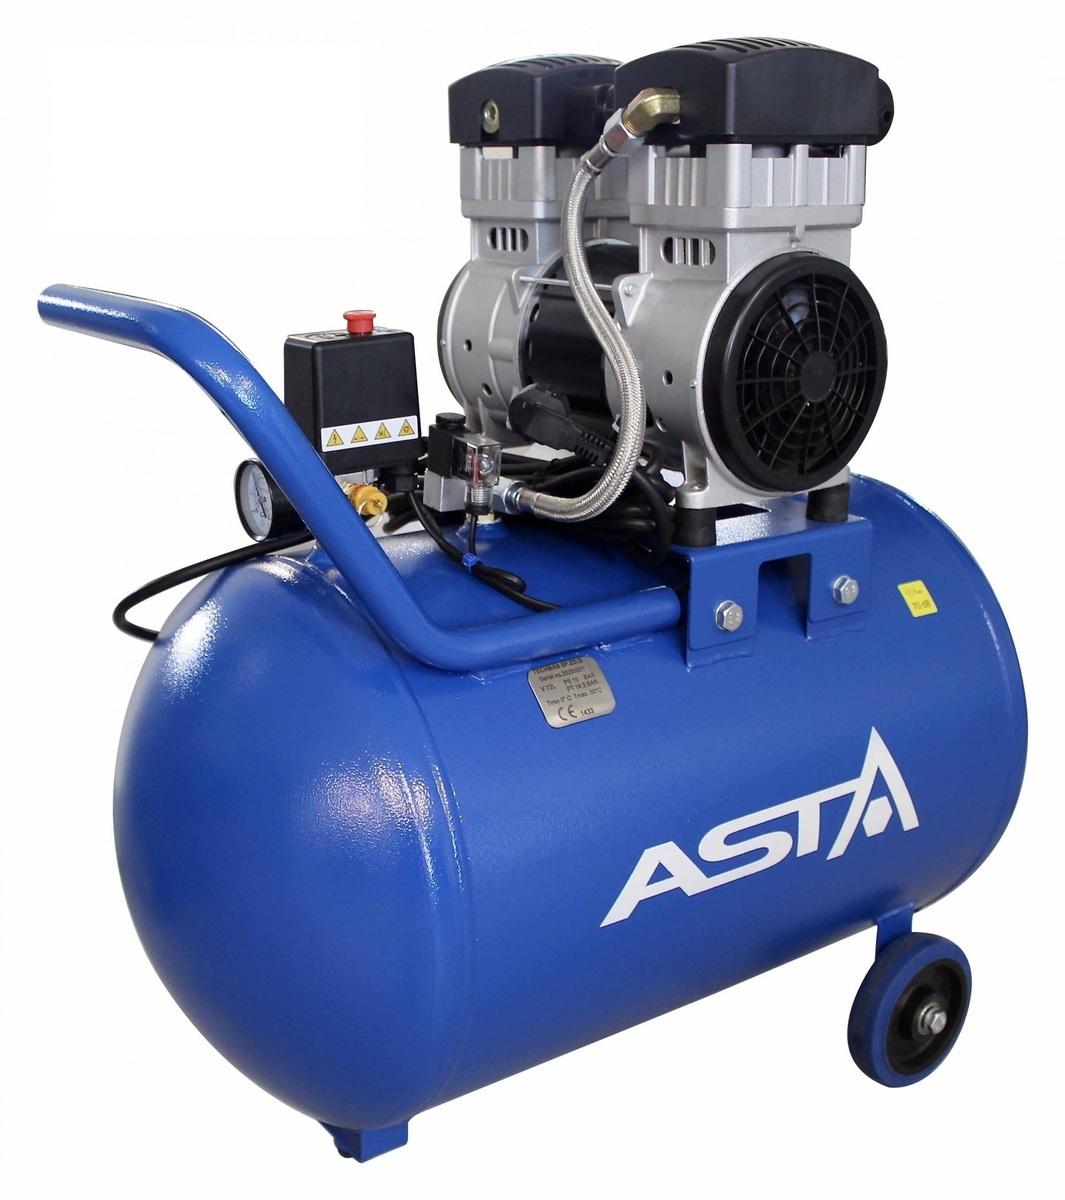 Bezolejový vzduchový kompresor dvouválcový, 72 l, 230 V - ASTA